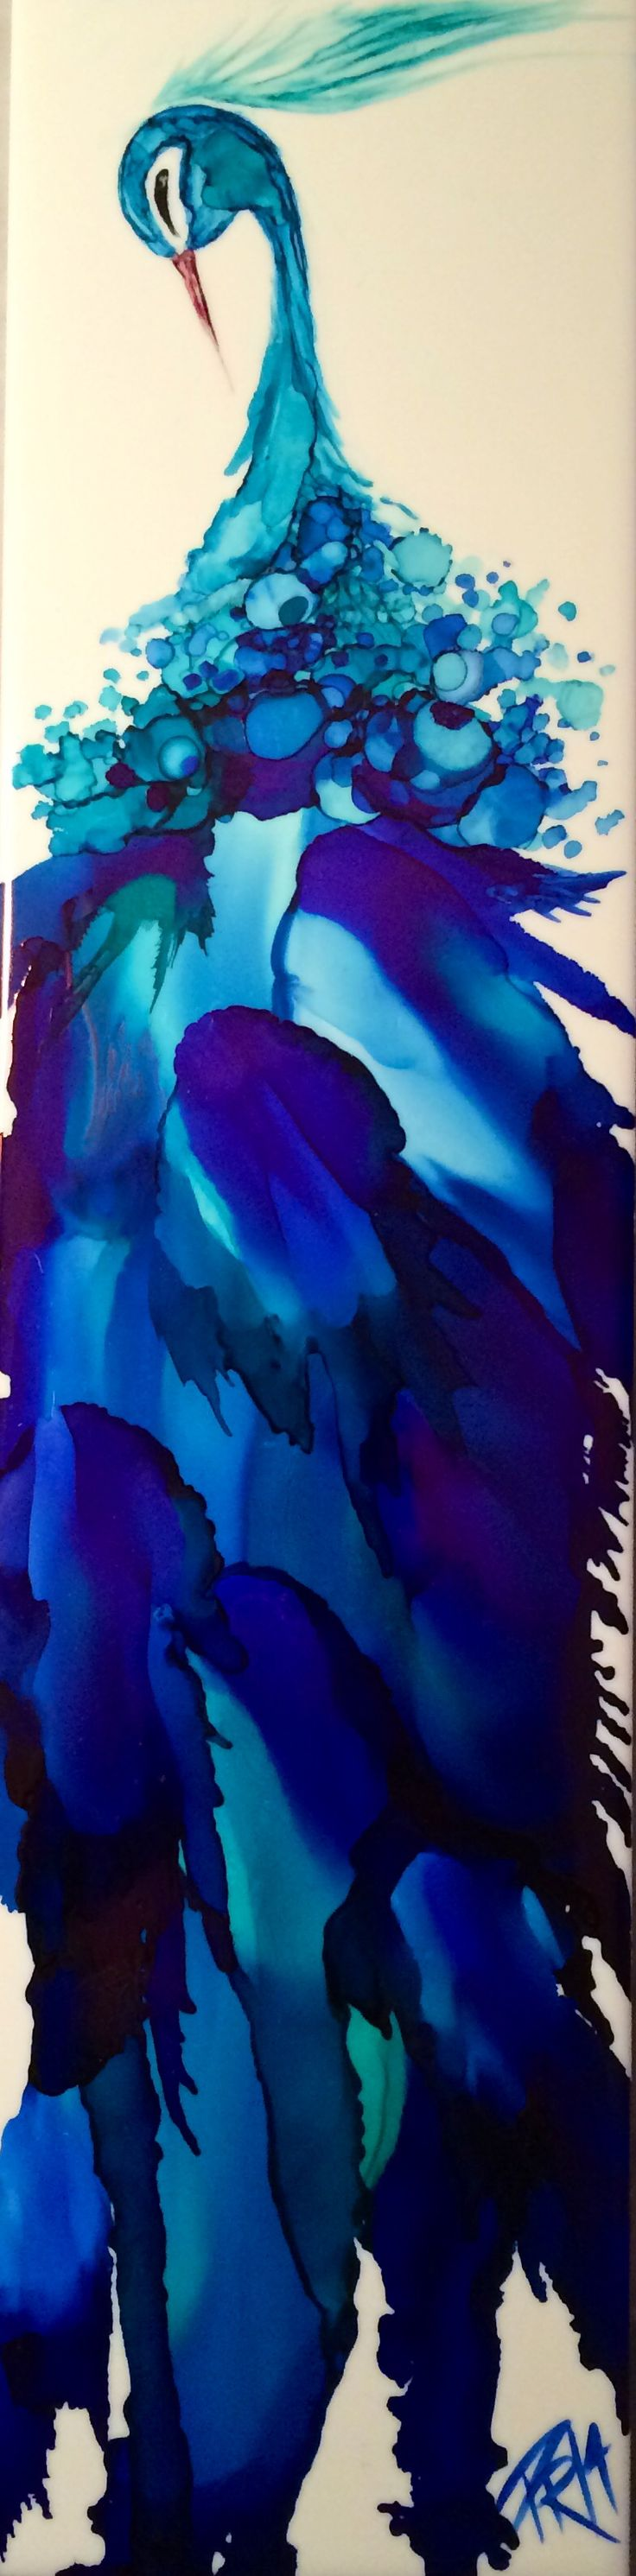 Indigo Peacock - by Pamella Radwan Alcohol Ink on ceramic tile